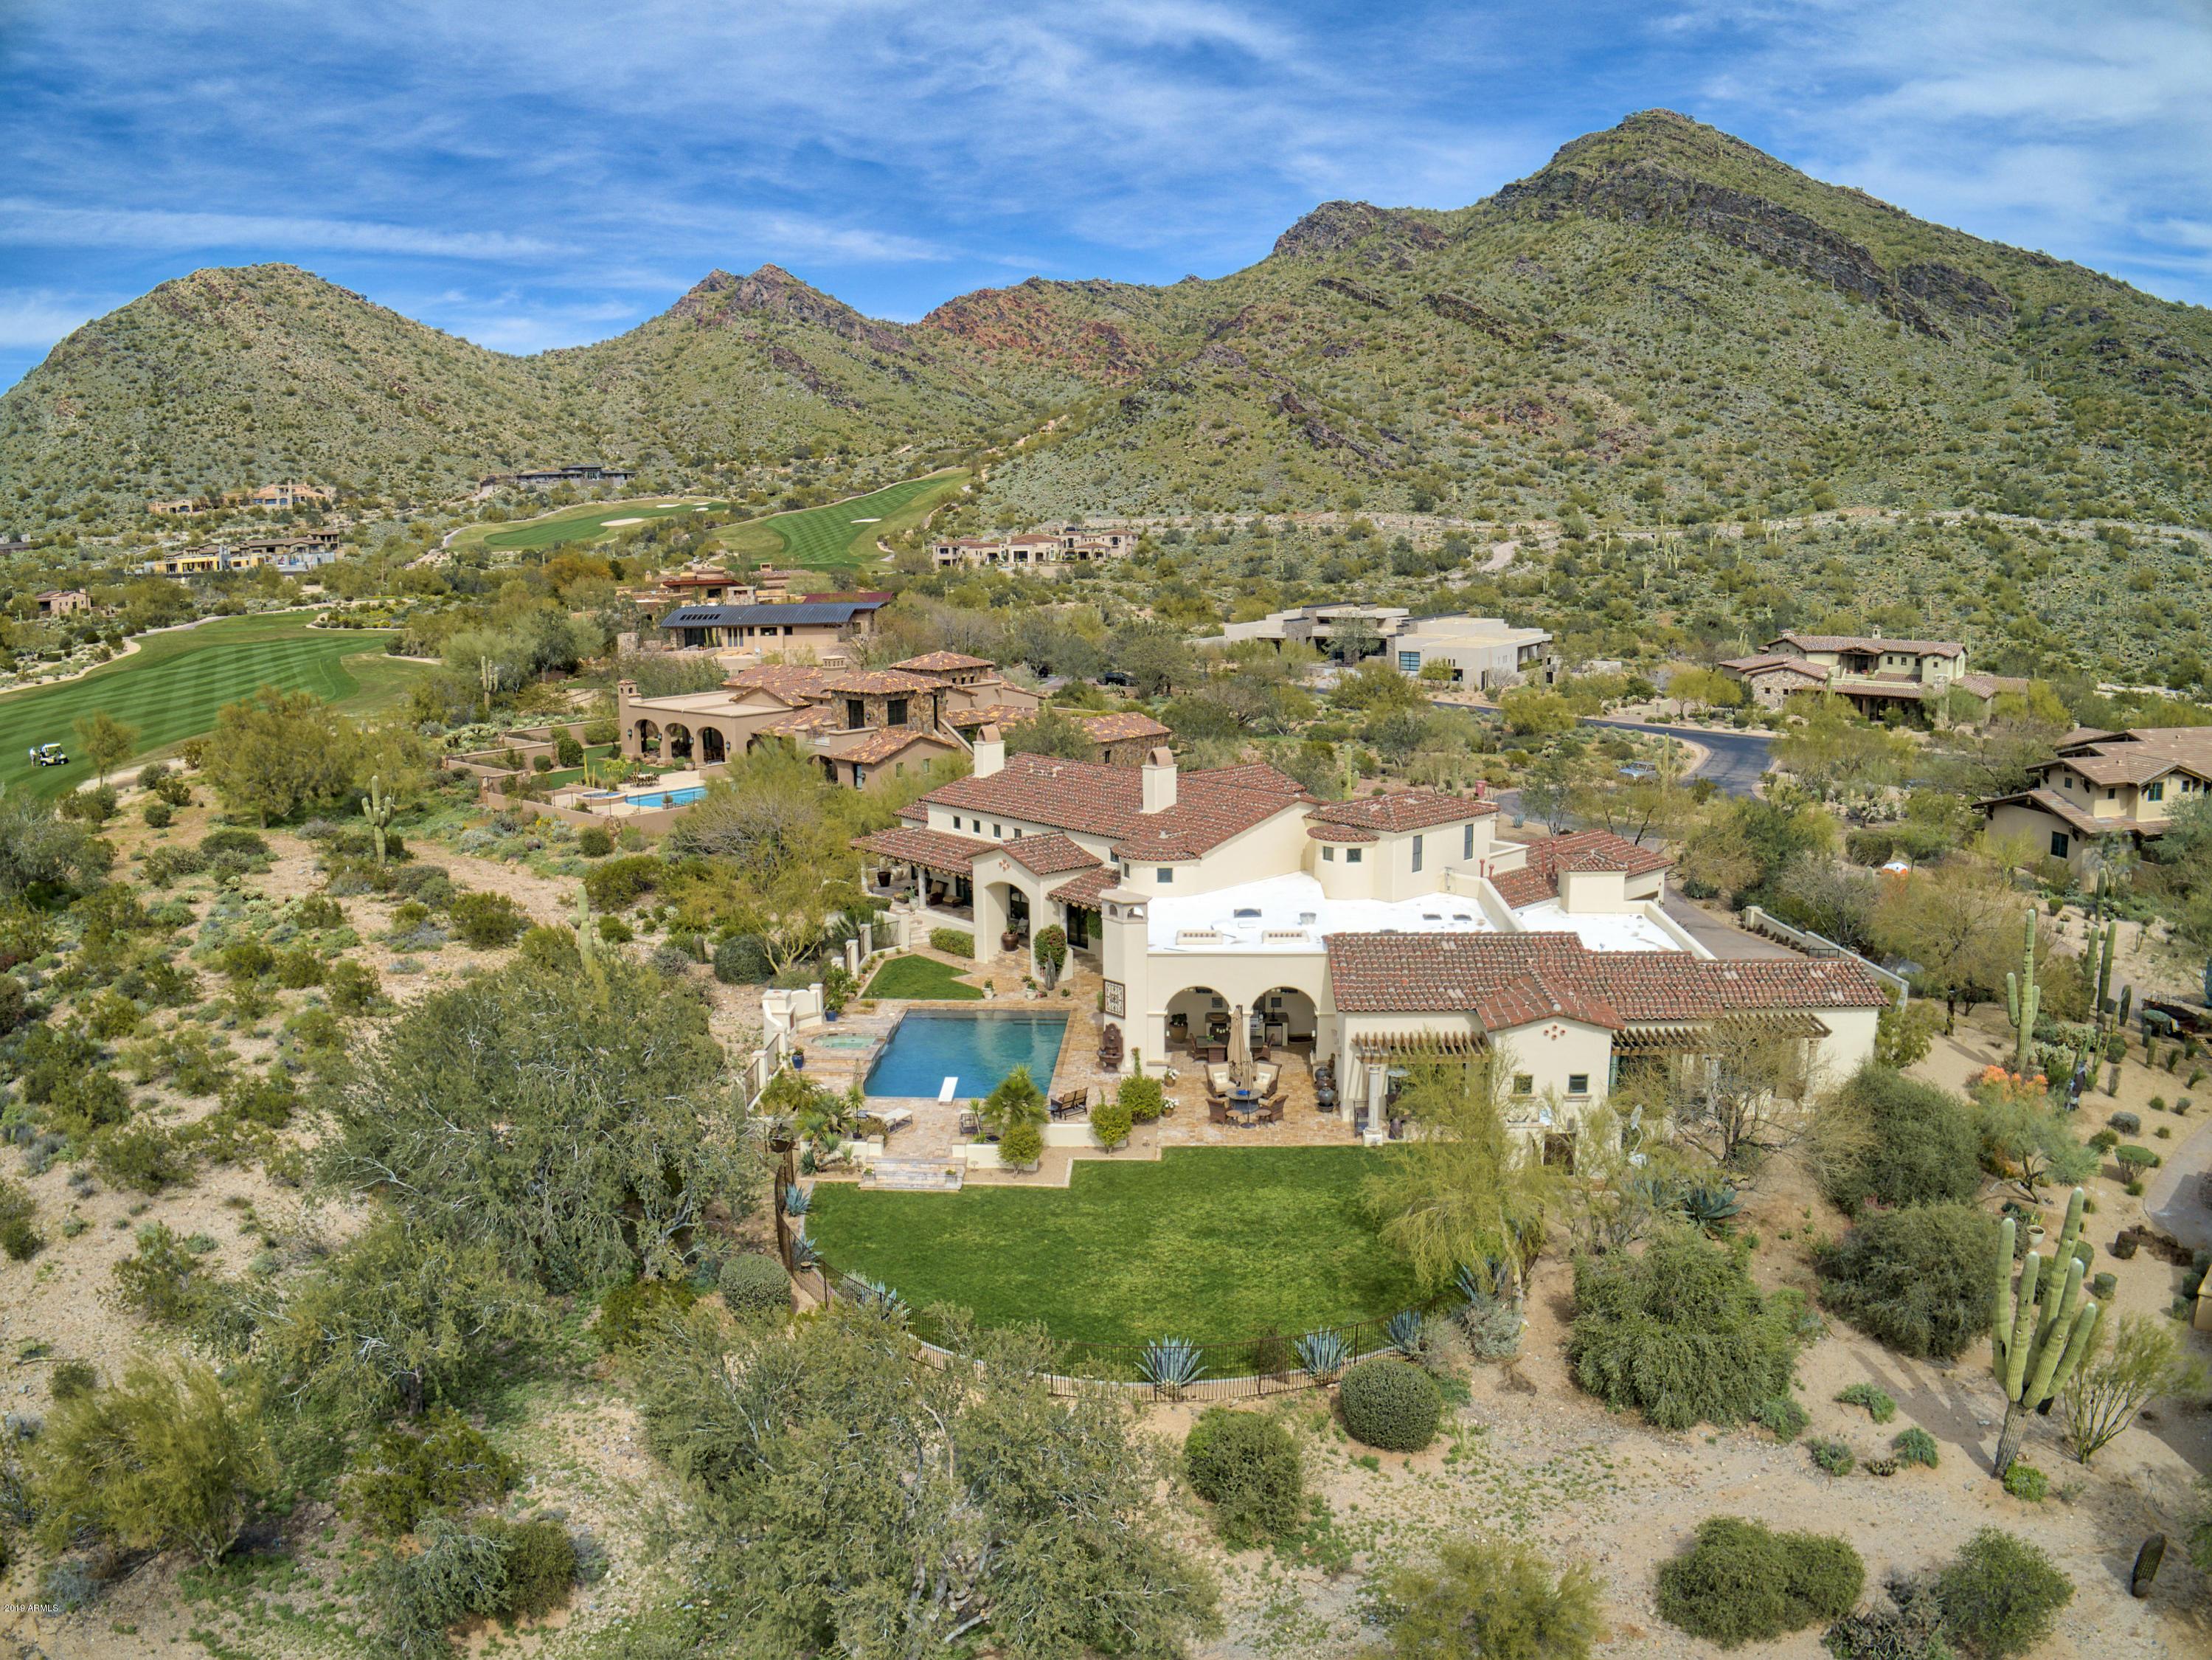 MLS 5900514 9820 E THOMPSON PEAK Parkway Unit 835, Scottsdale, AZ 85255 Scottsdale AZ Private Pool